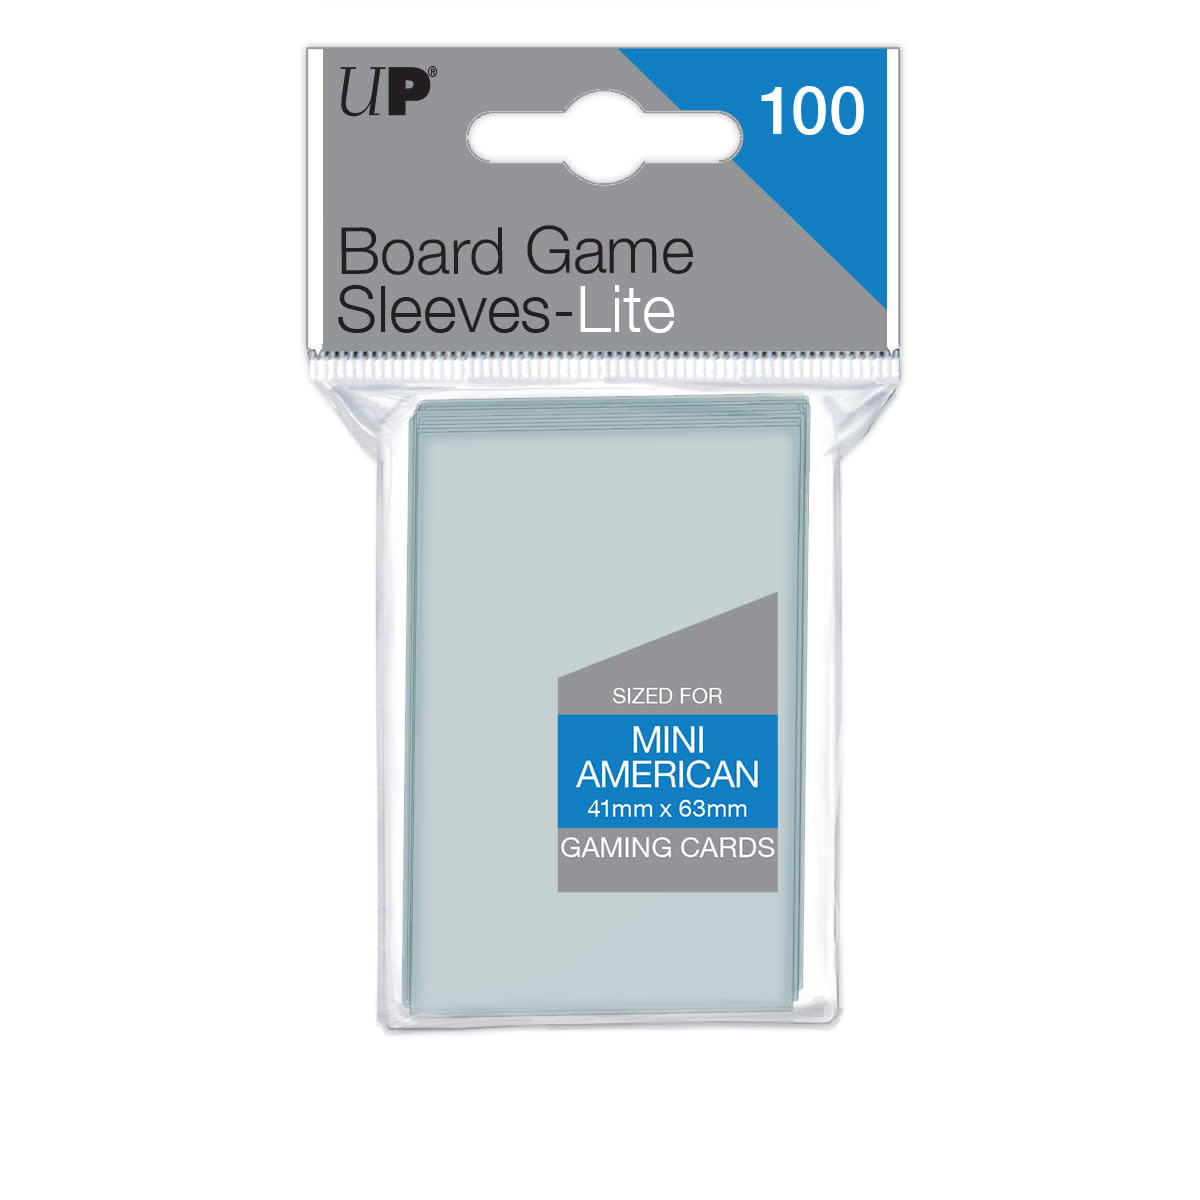 Ultra Pro - 41mm x 63mm Lite Mini American Board Game Sleeves 100 ct.